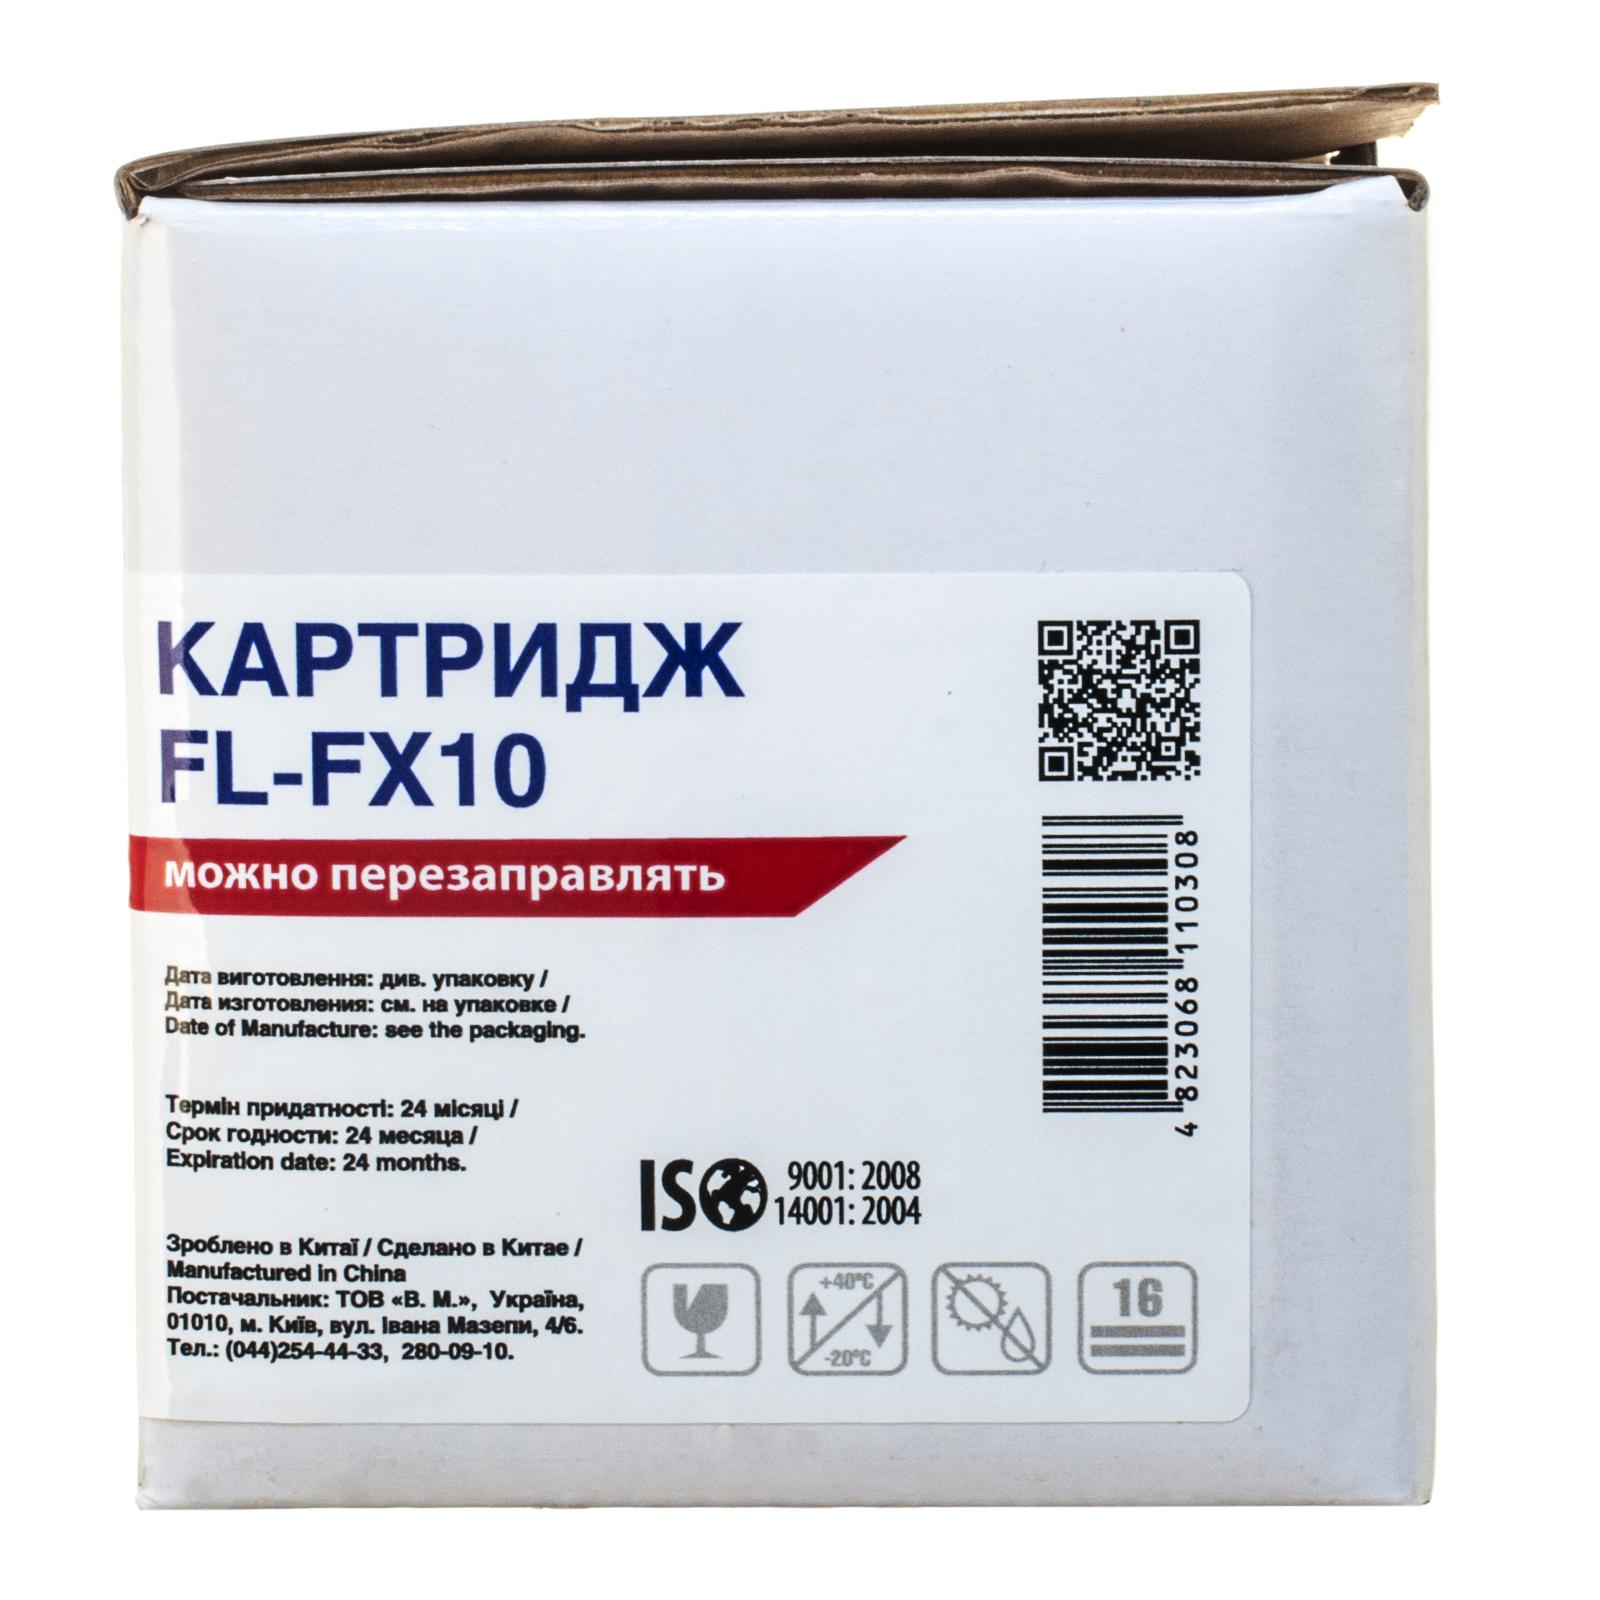 Картридж FREE Label CANON FX-10 (для MF4120/ 4140) (FL-FX10) изображение 3